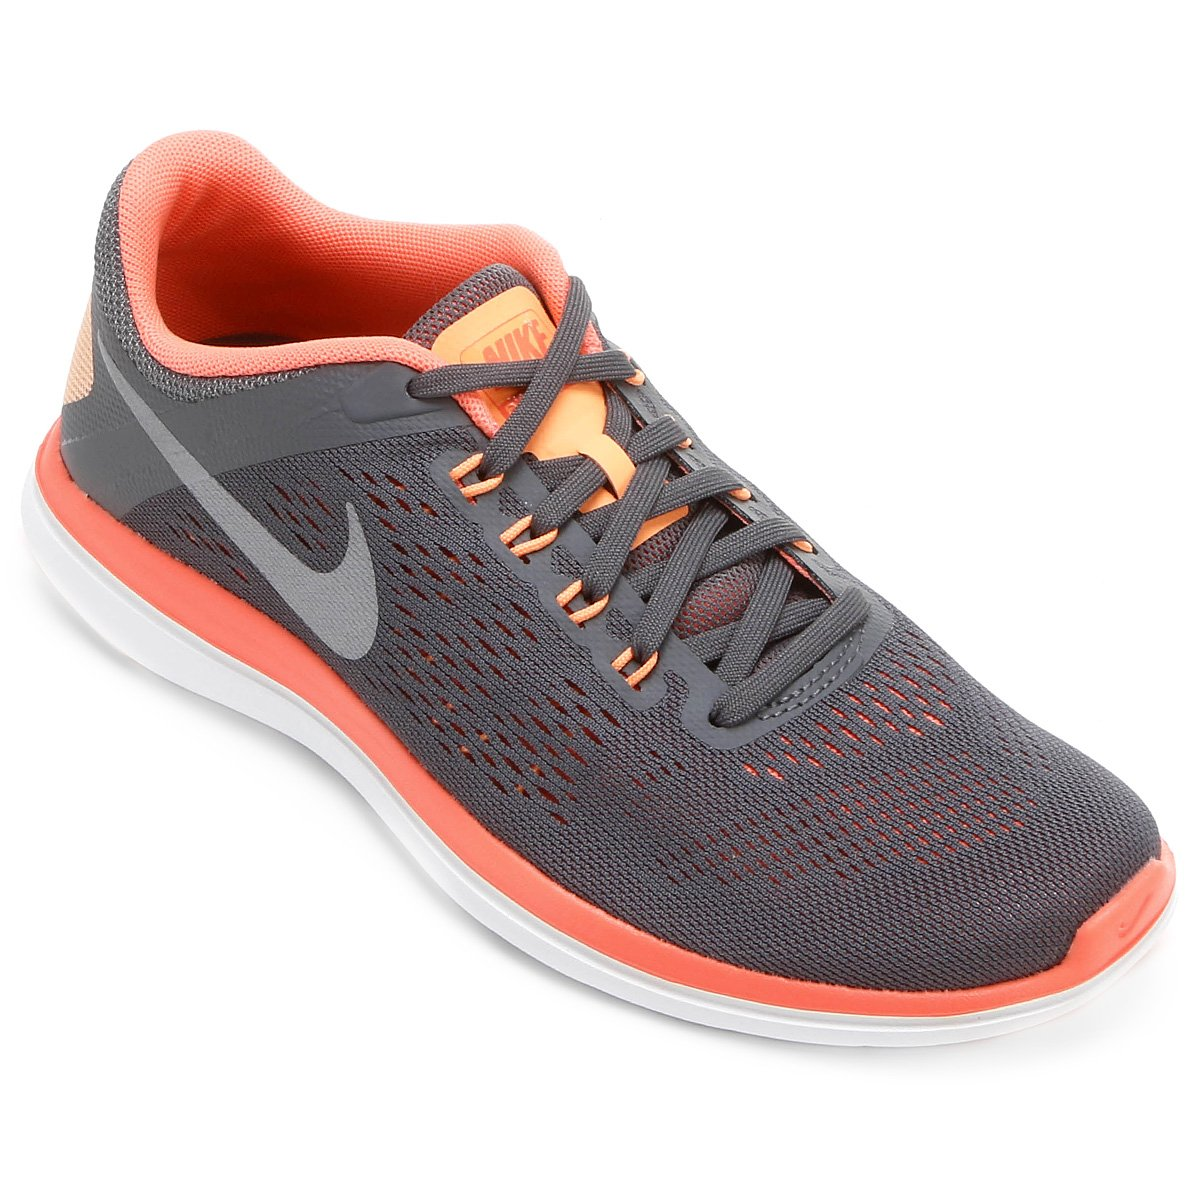 bc2f89d183d Tênis Nike Flex 2016 RN Feminino - Compre Agora